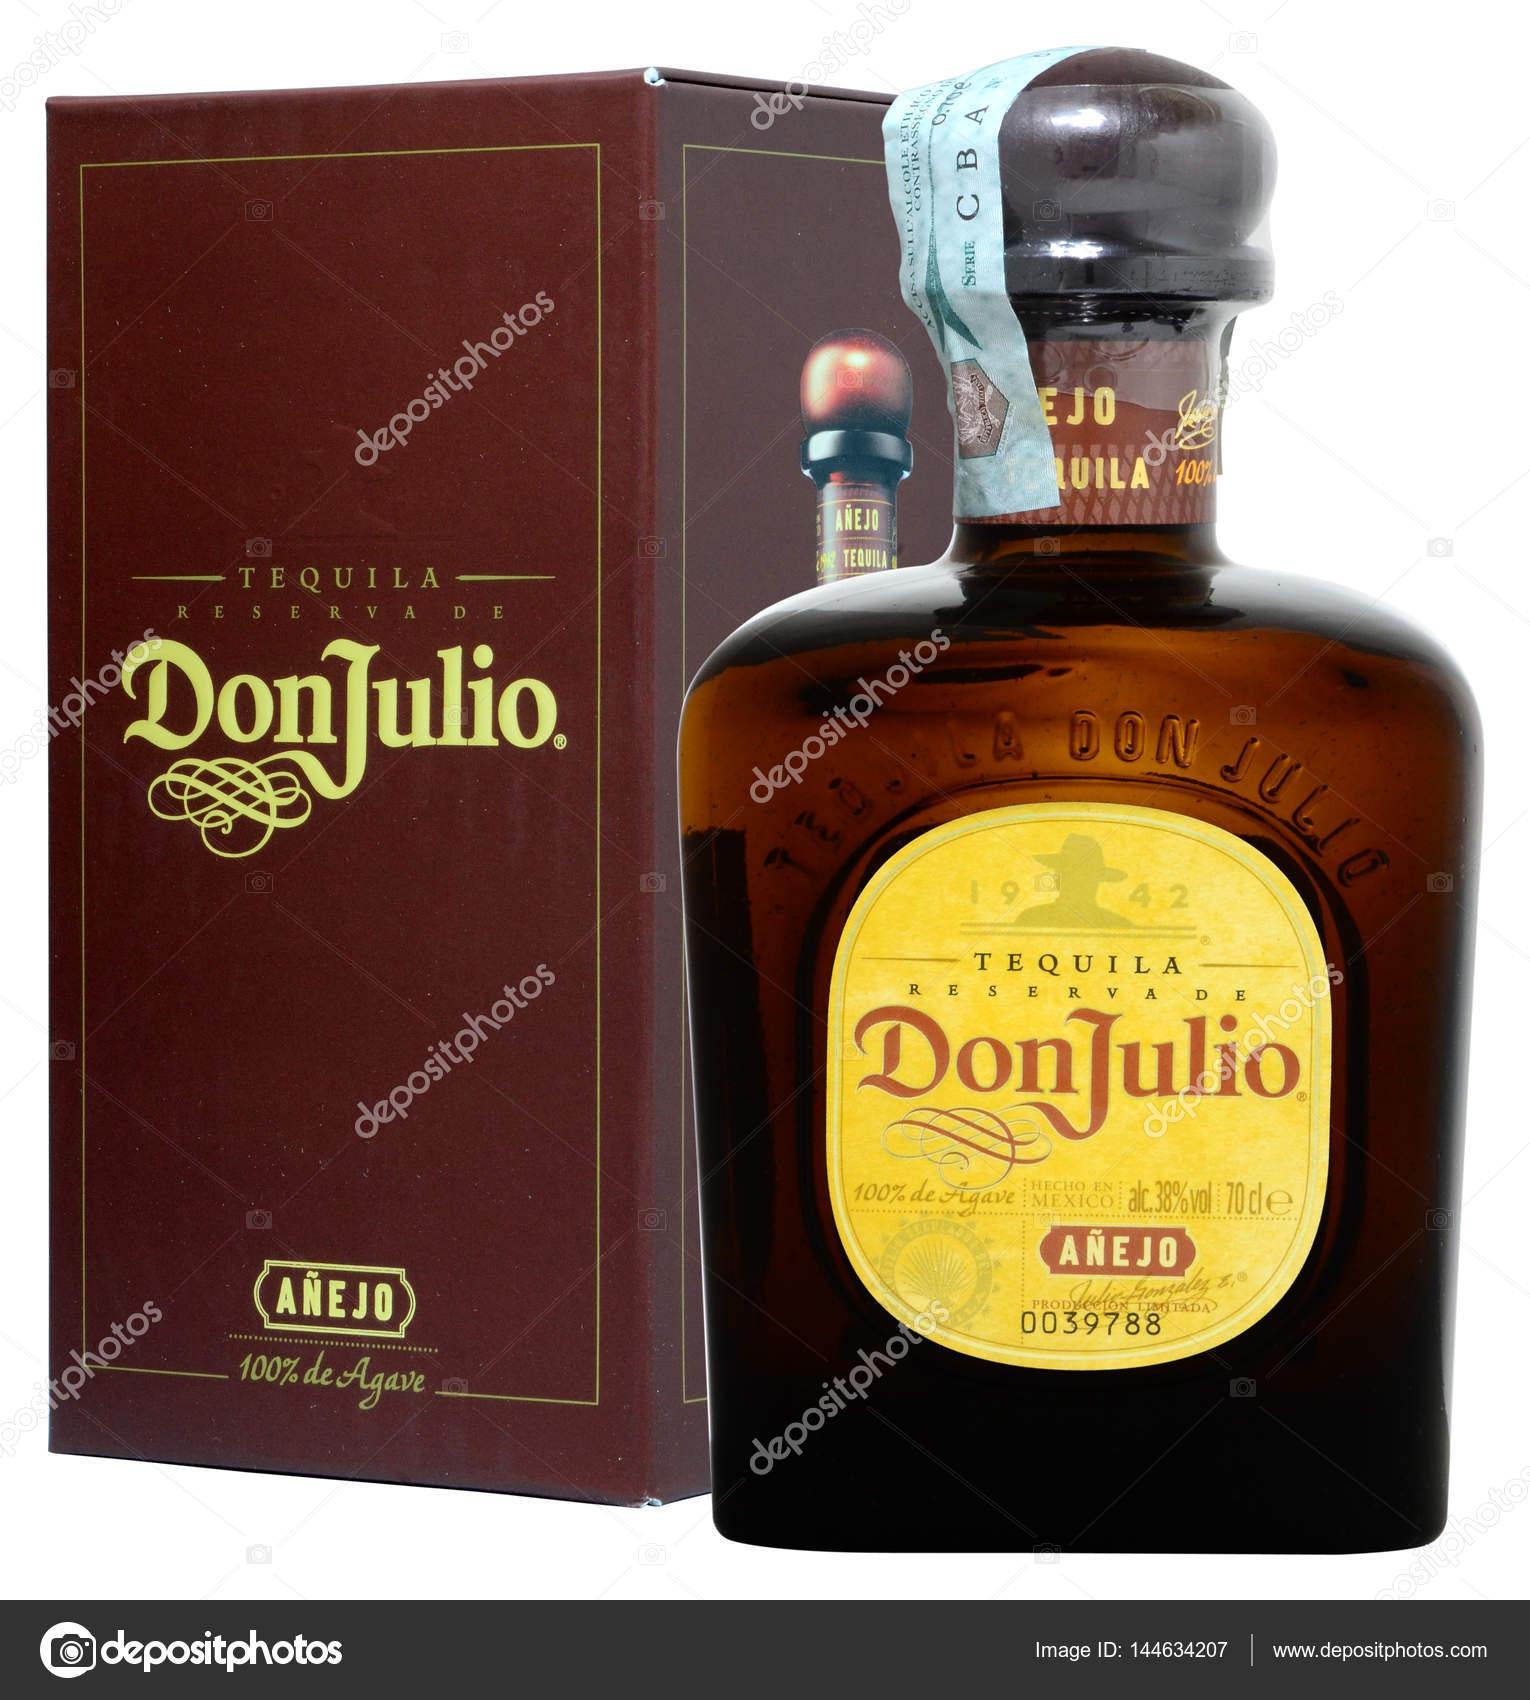 Fotos Botellas De Tequila Don Julio Tequila Don Julio Anejo